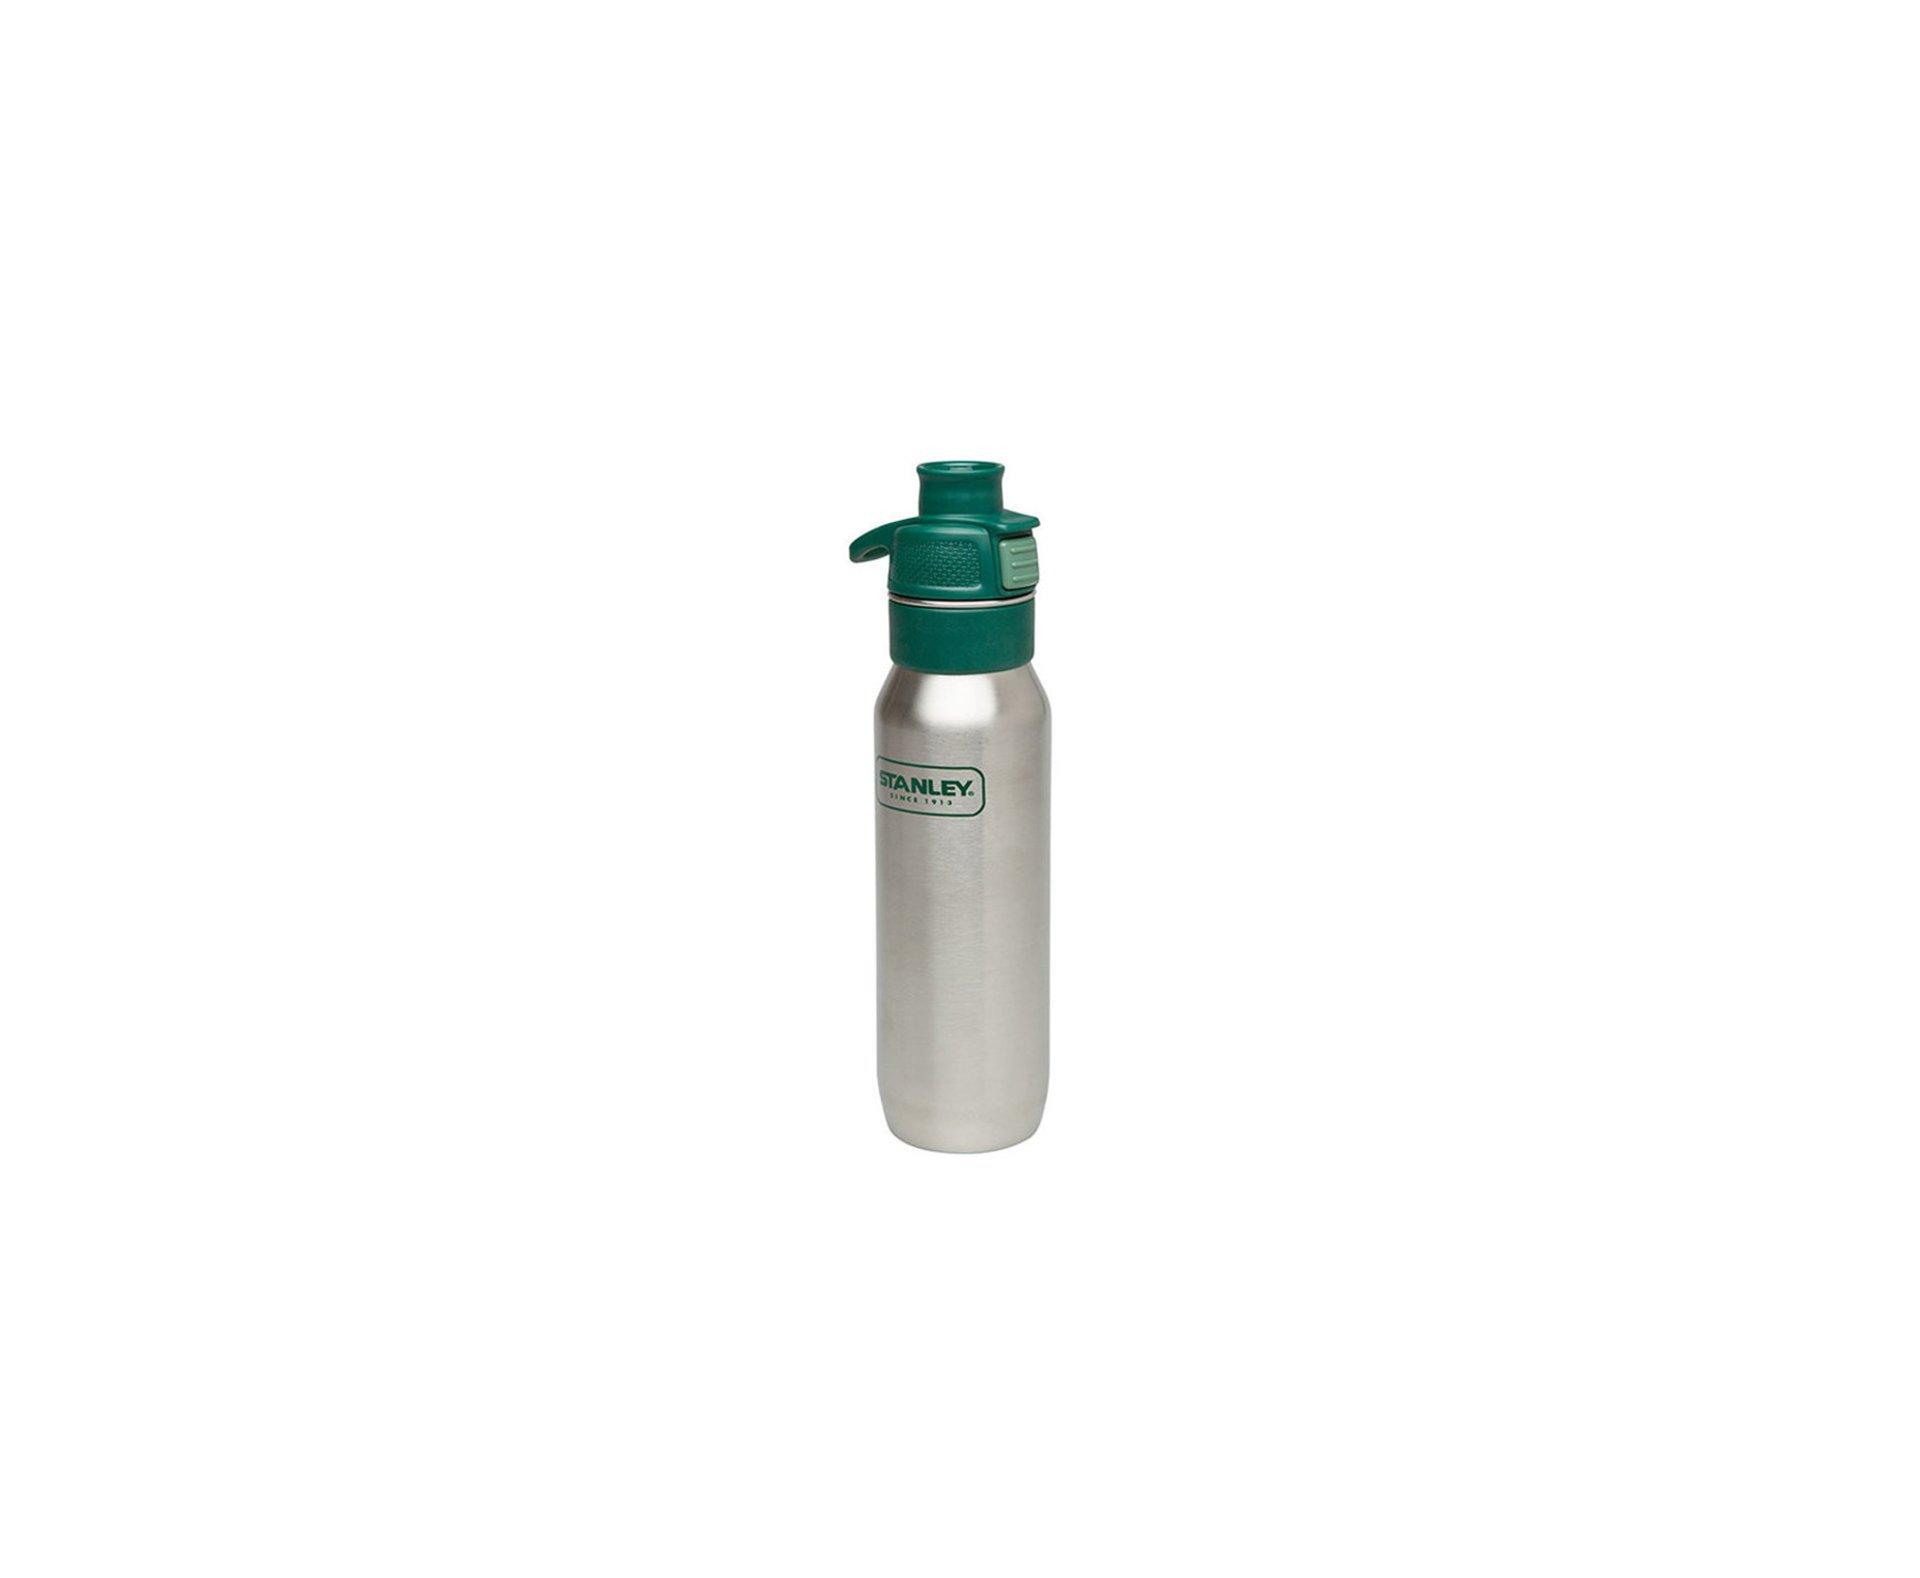 Garrafa Termica Stanley One Hand H2o Inox 709ml